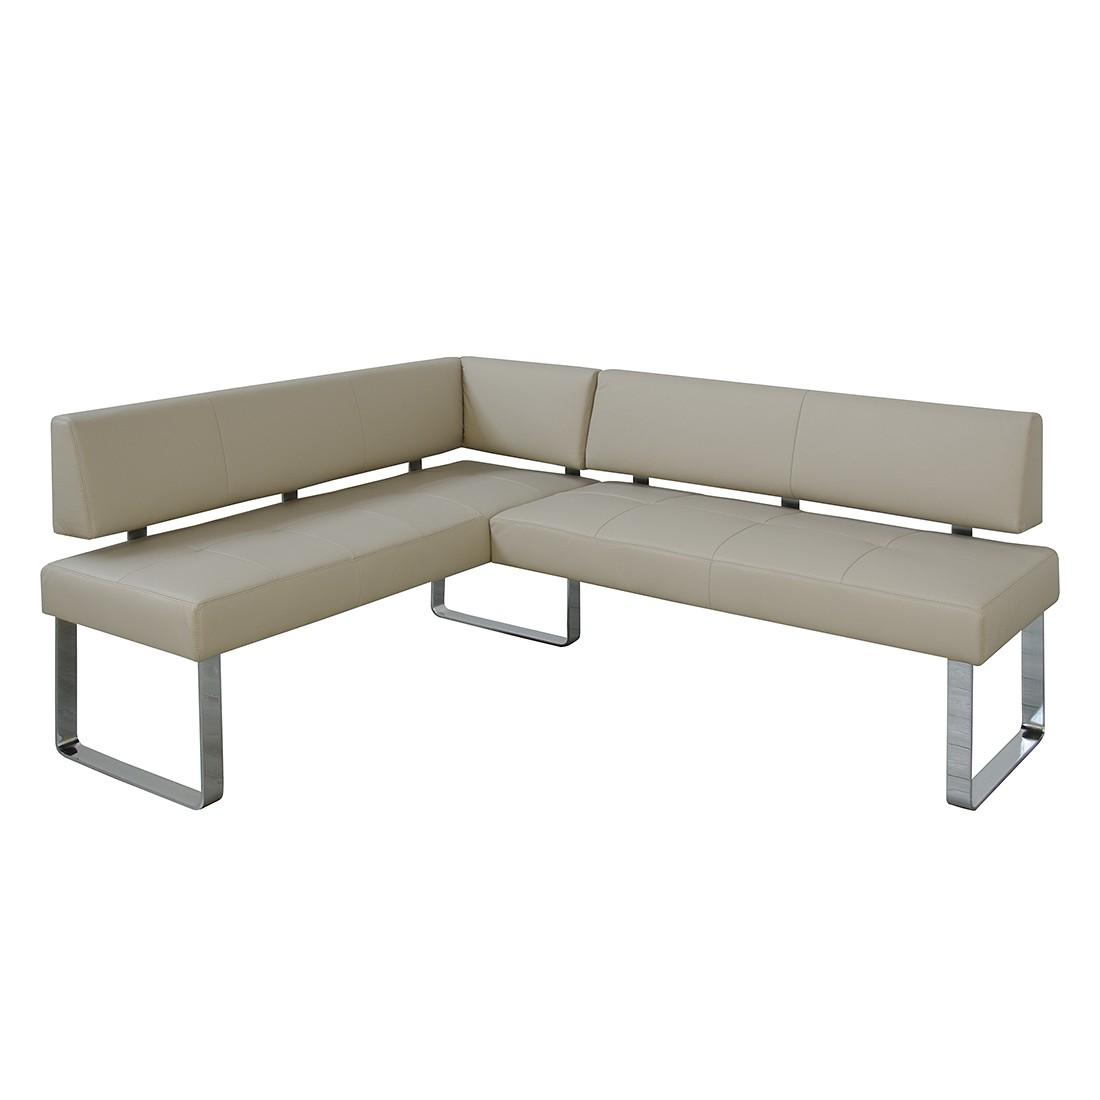 eckbank echt leder preisvergleiche erfahrungsberichte. Black Bedroom Furniture Sets. Home Design Ideas